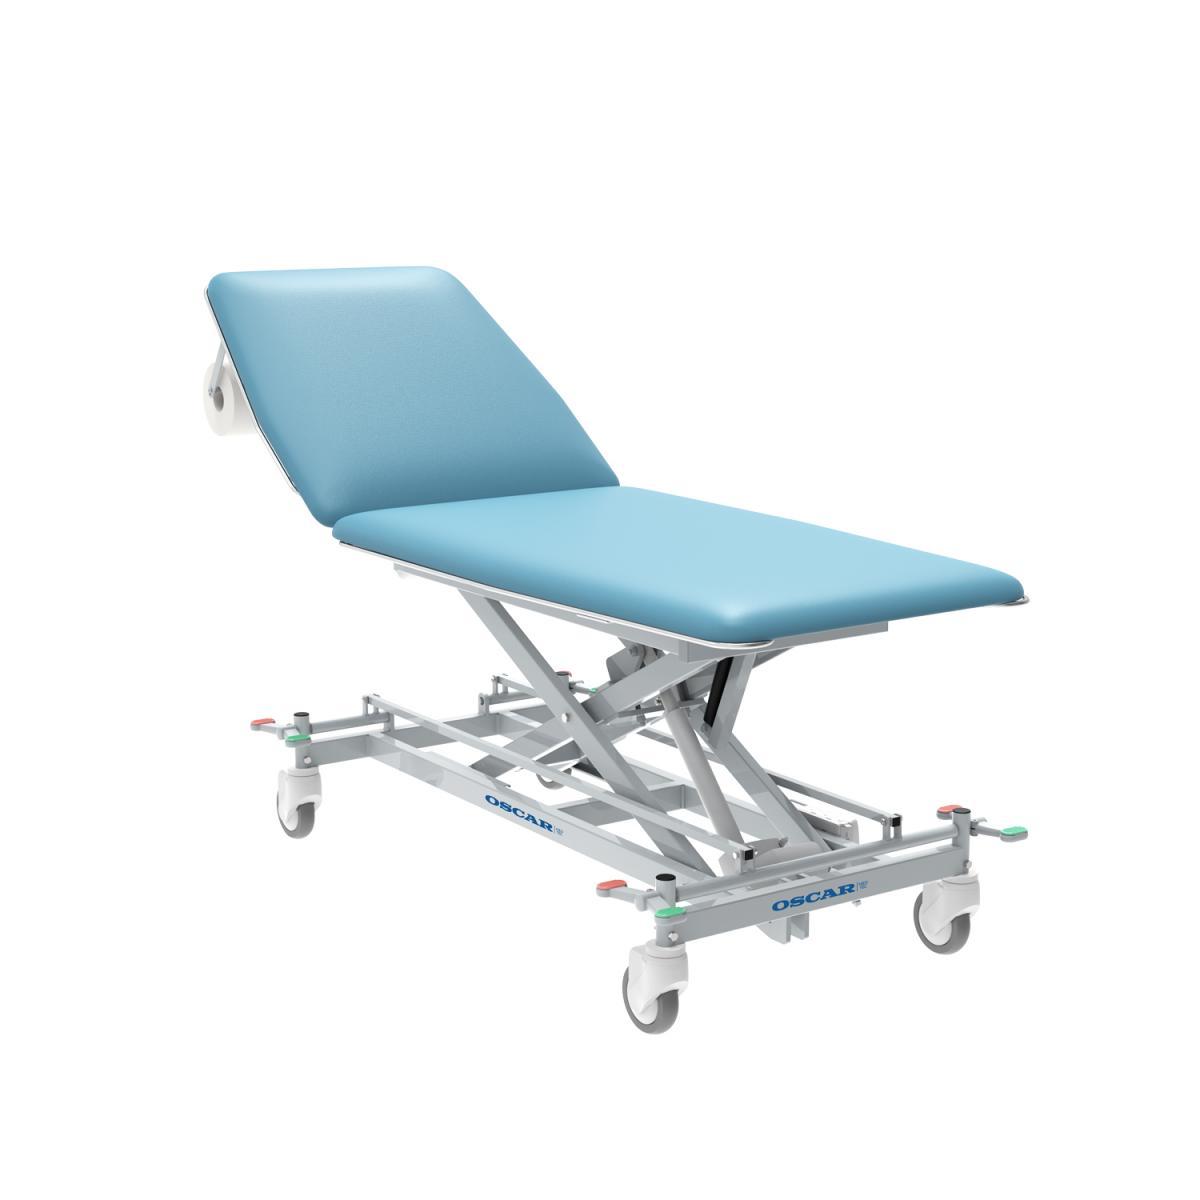 Examination table Premium, hydraulic